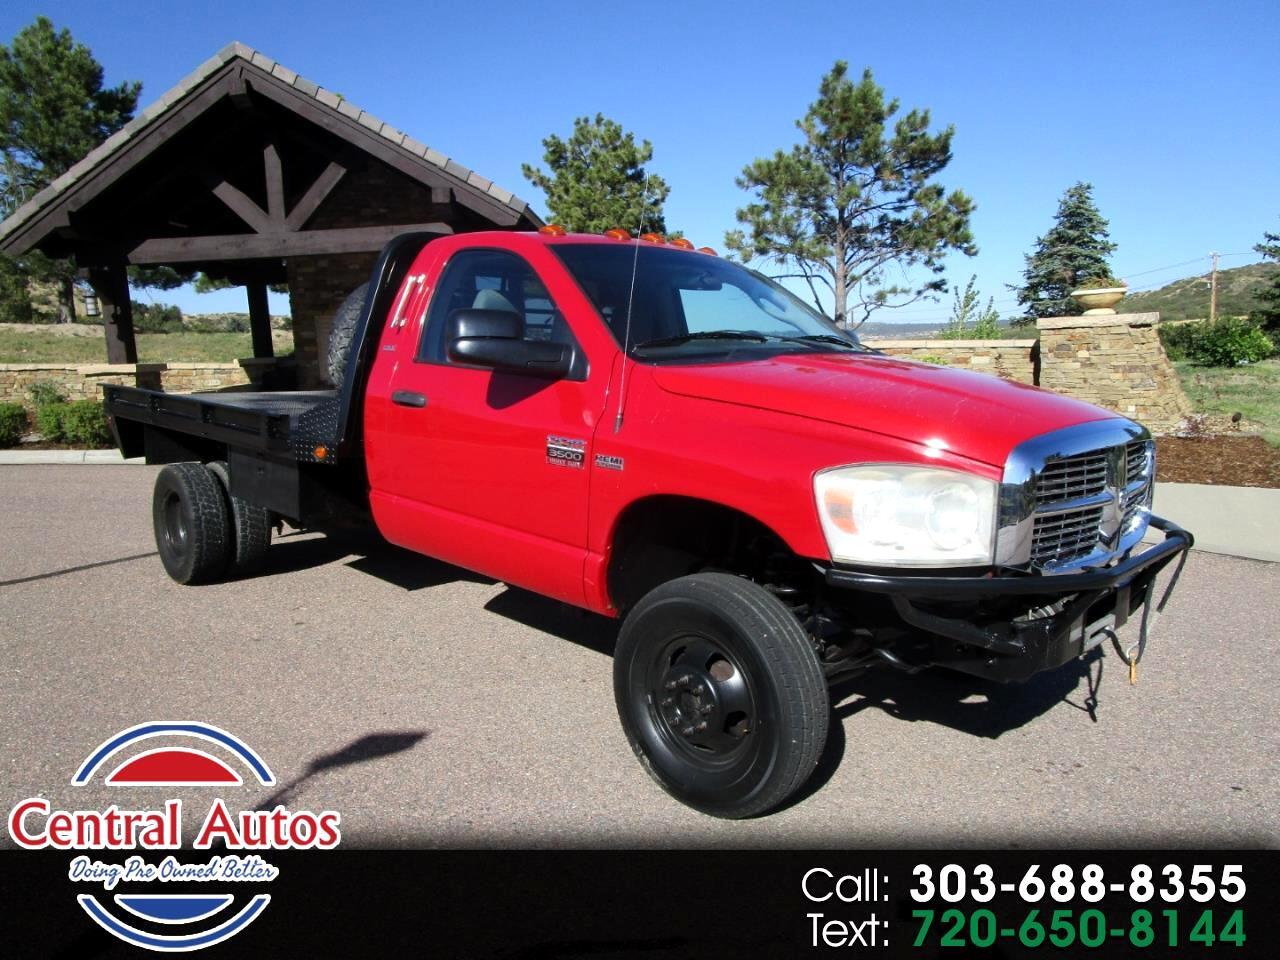 "2007 Dodge Ram 3500 4WD Reg Cab 84"" CA 167.5"" WB"